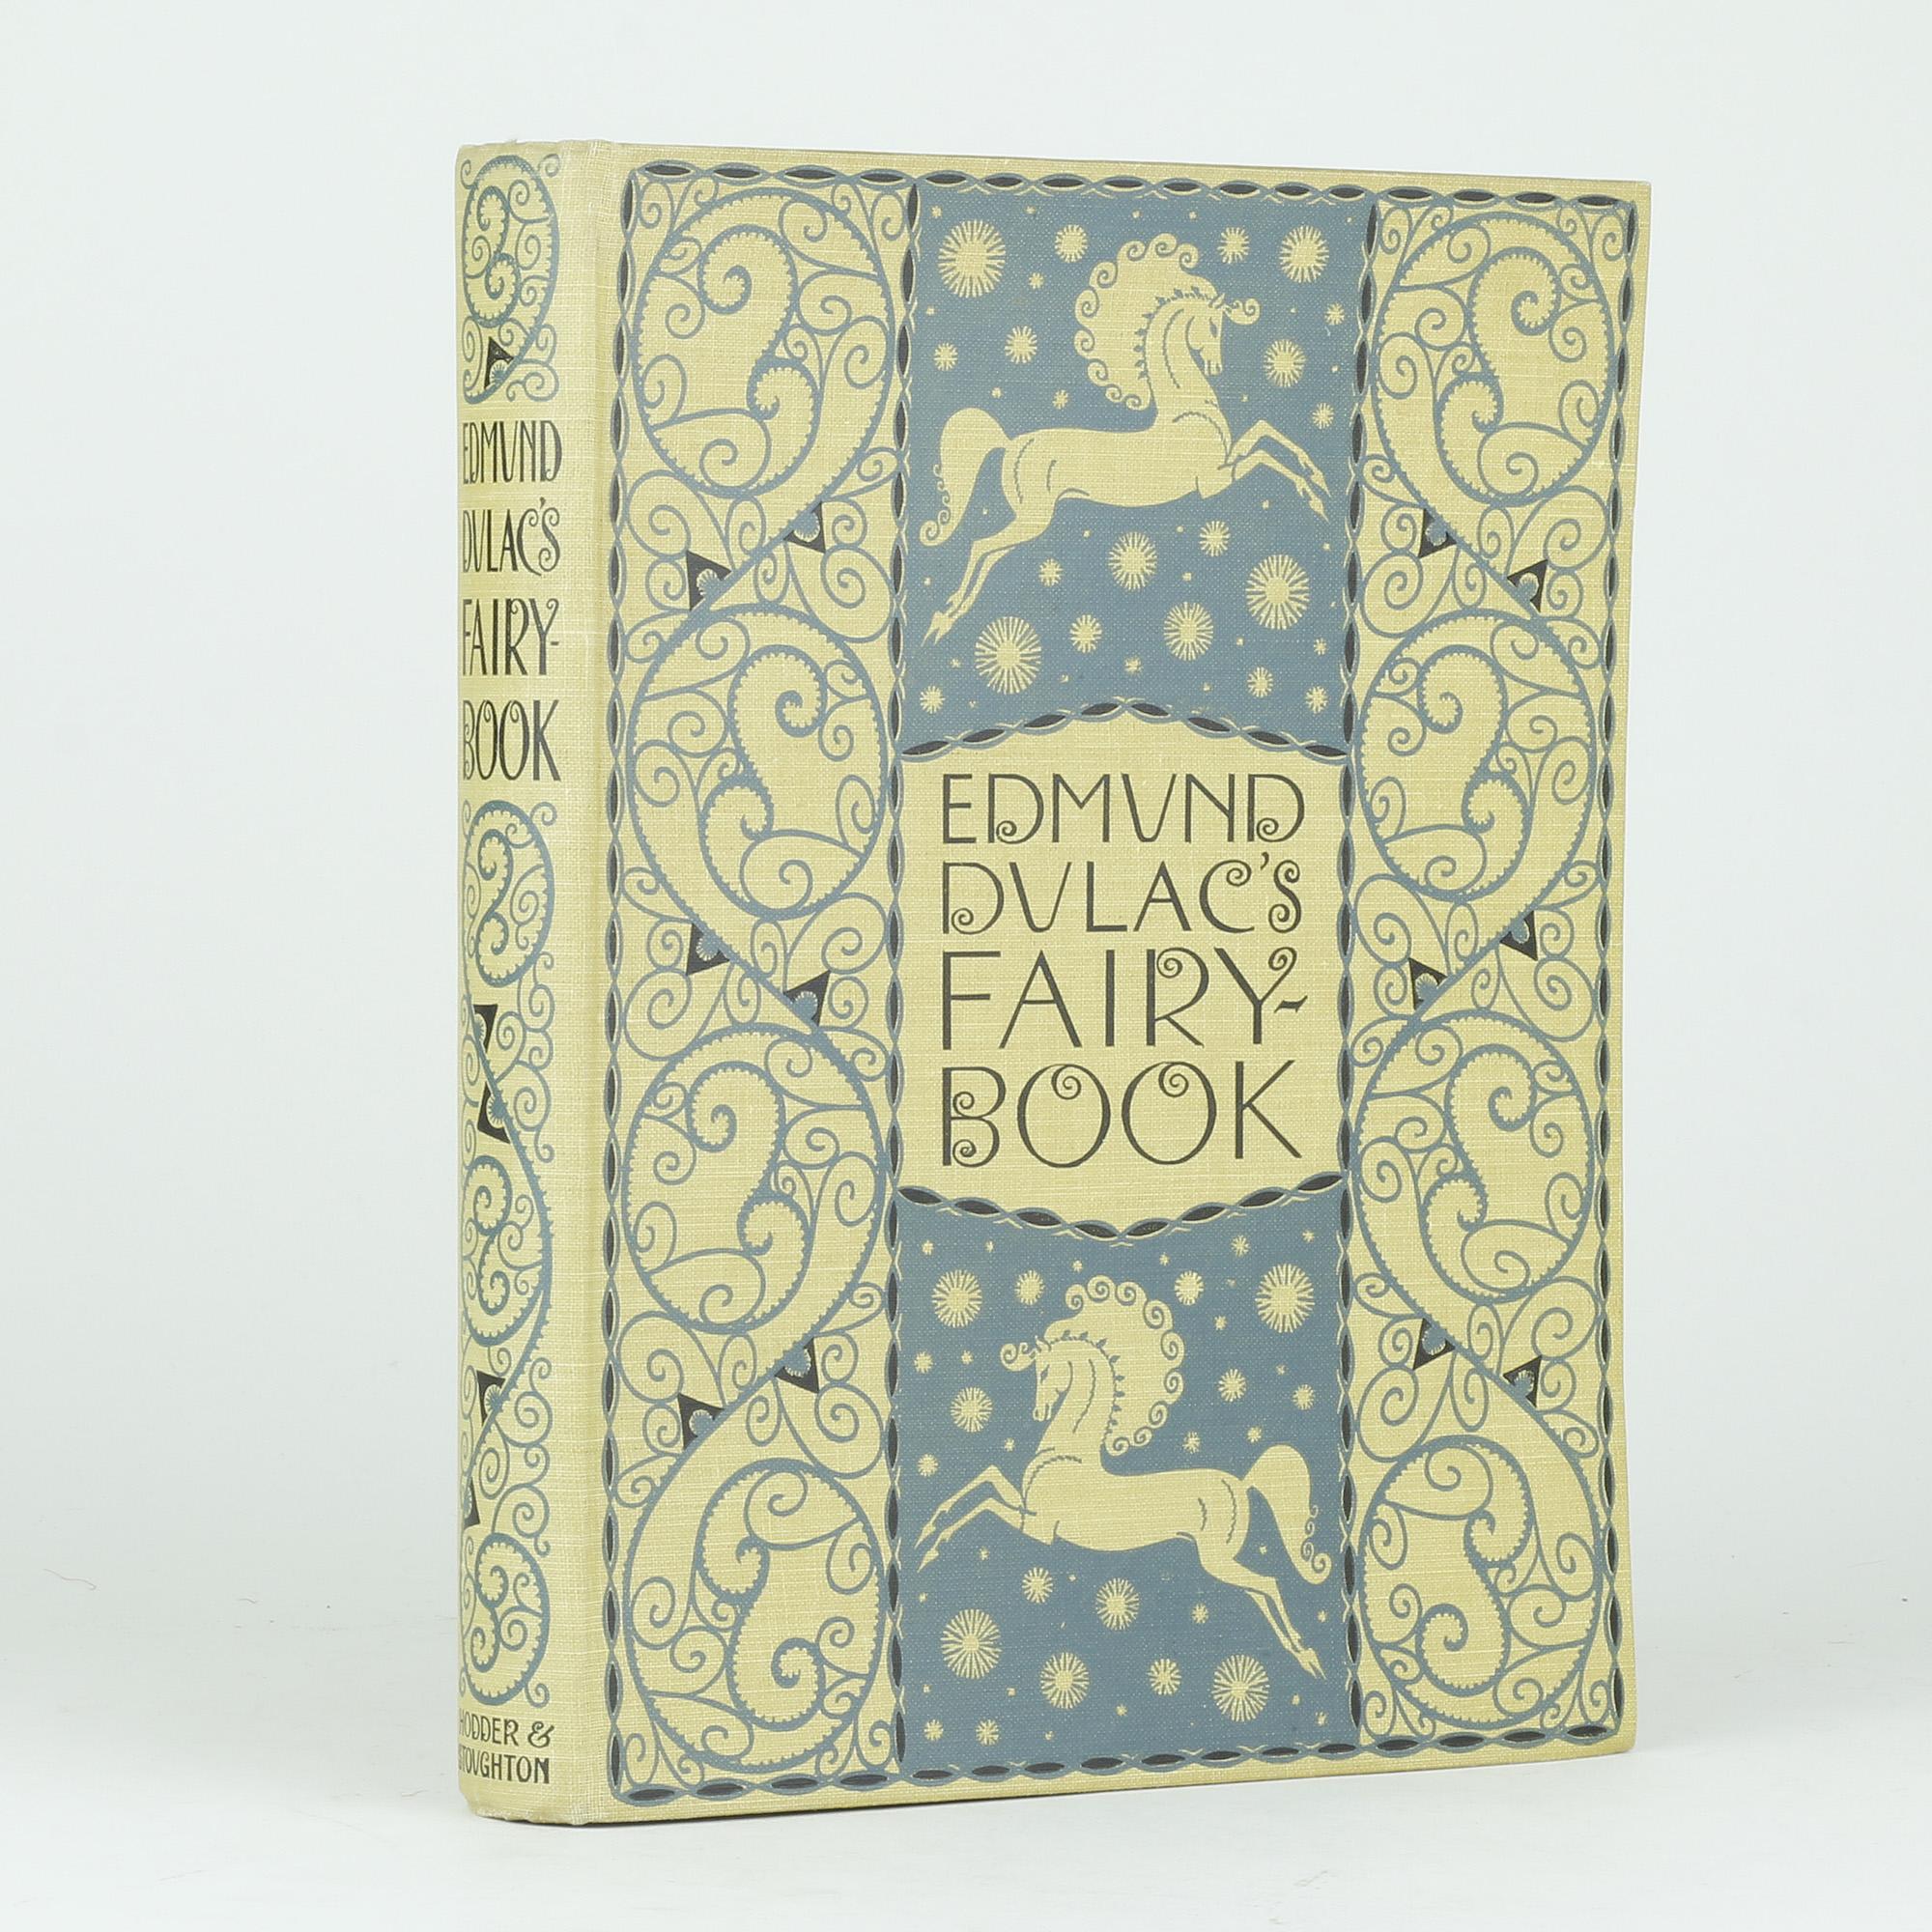 Edmund Dulac's Fairy Tale Book